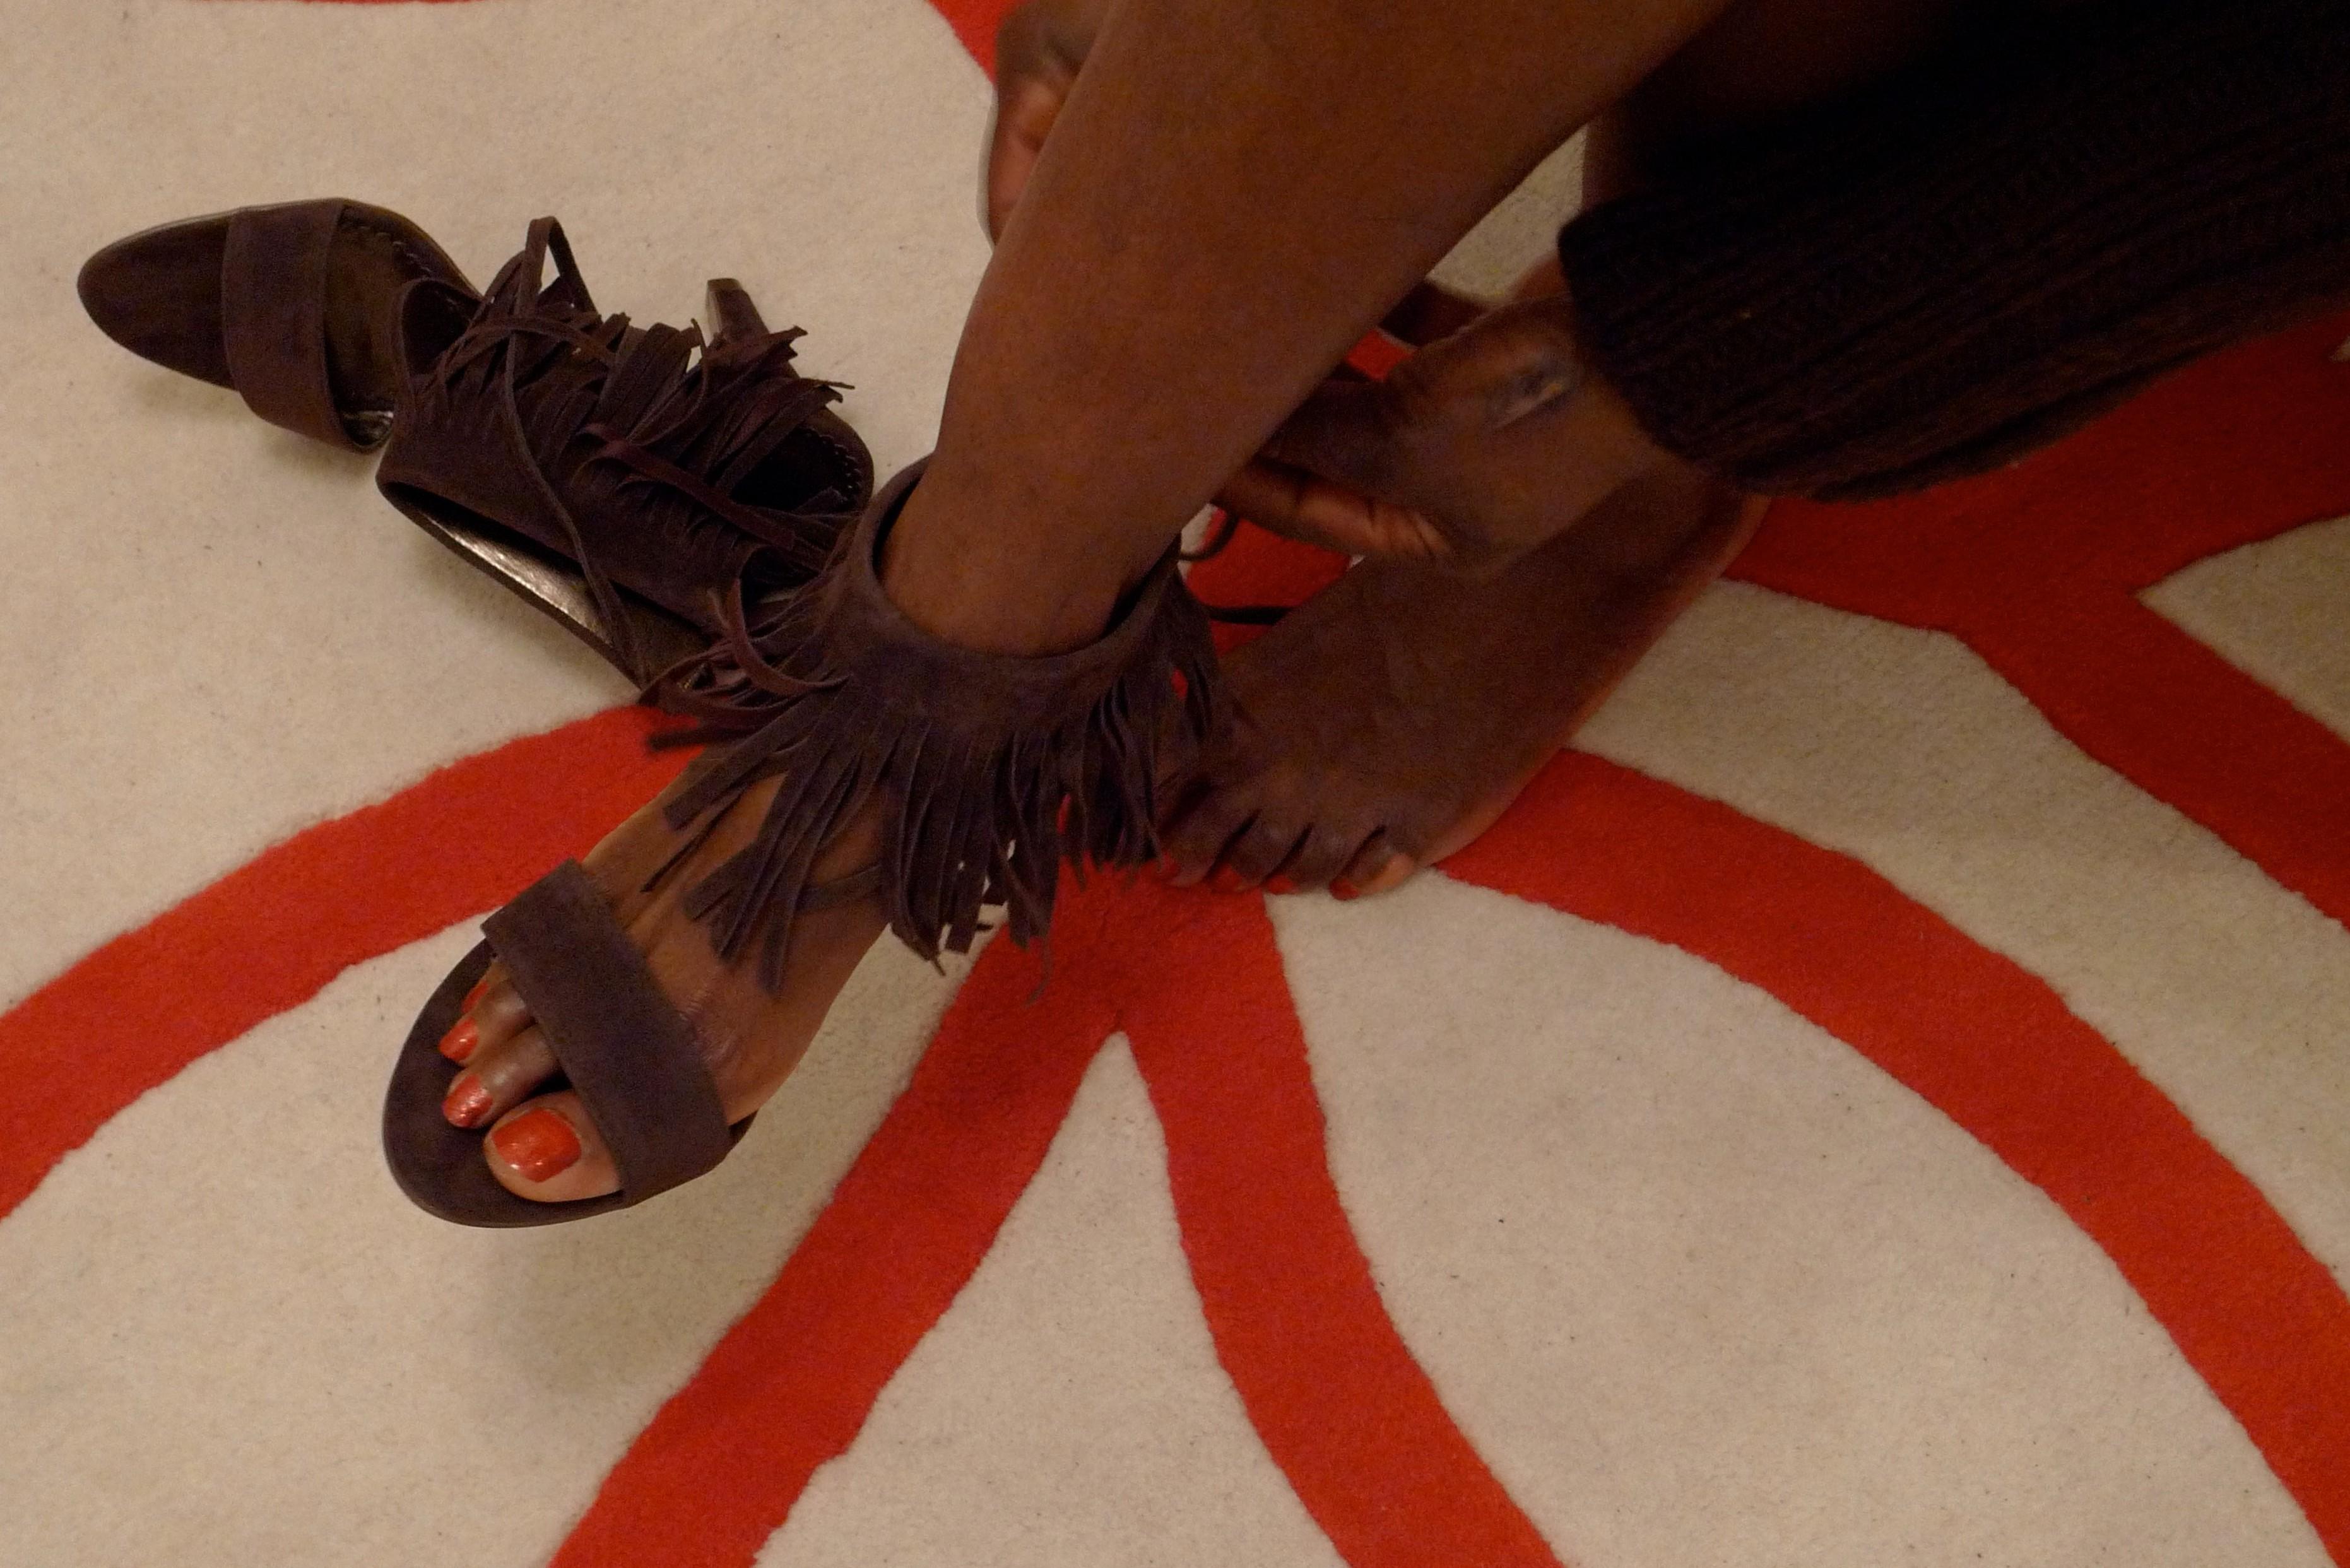 Putting on new heels